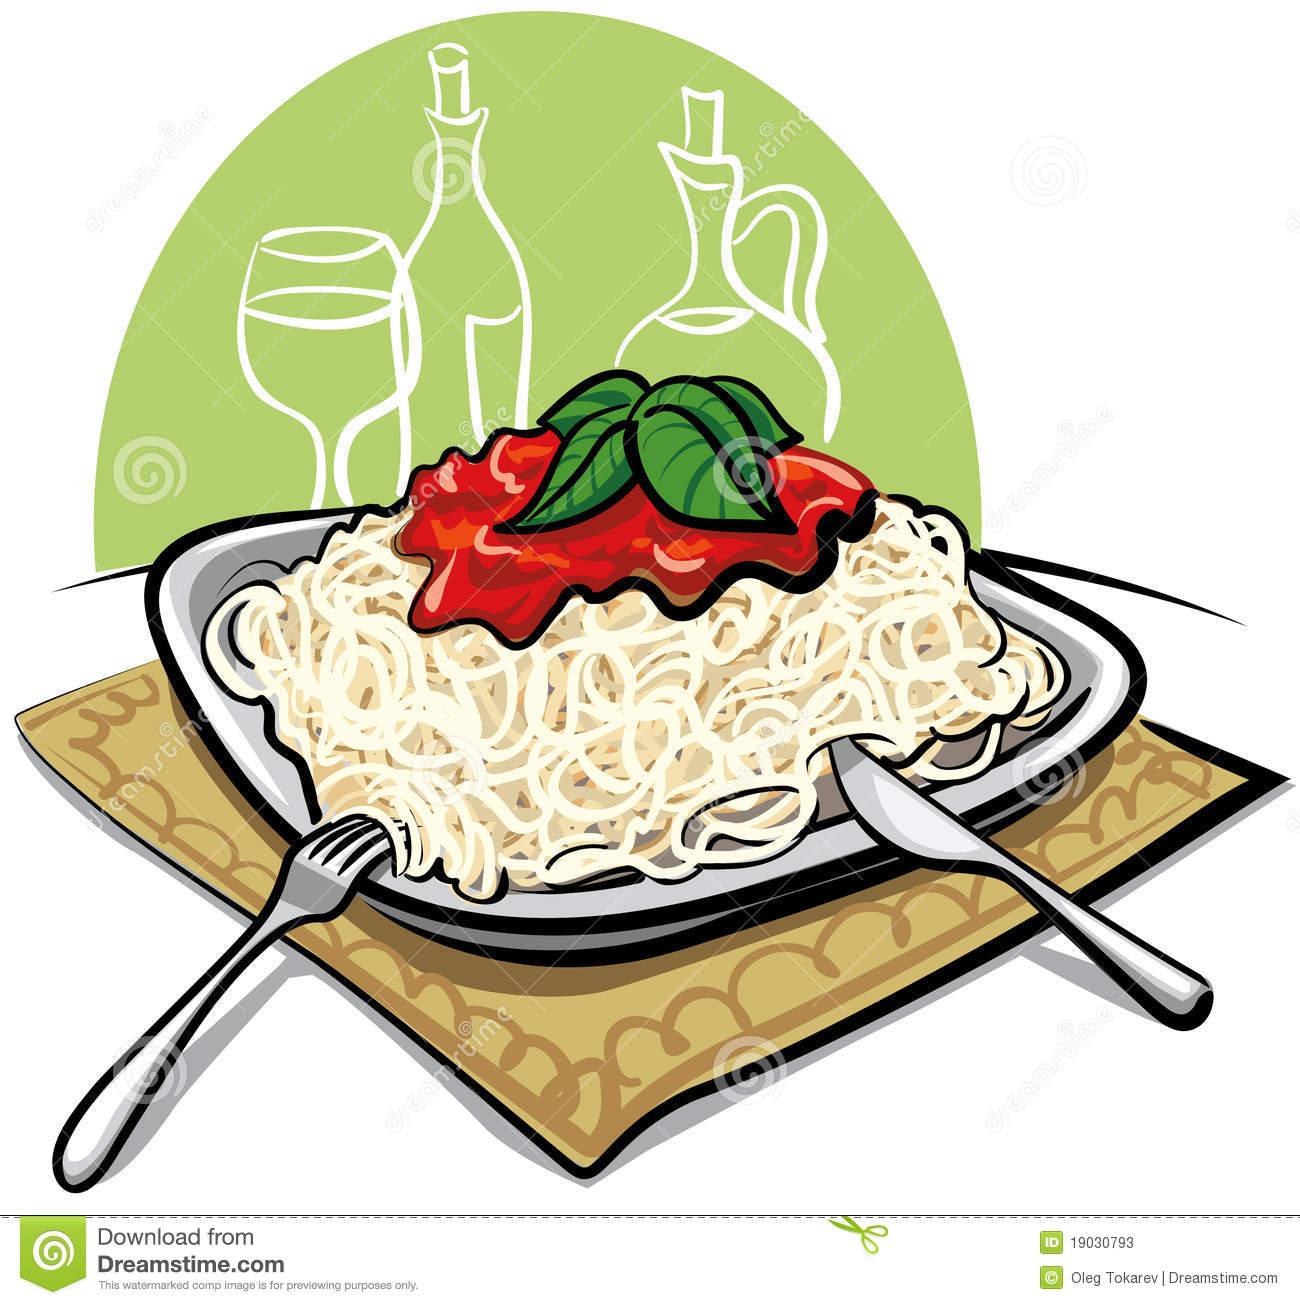 Spaghetti clipart noodle Clipart Plate plate%20of%20spaghetti%20clipart Free Clipart